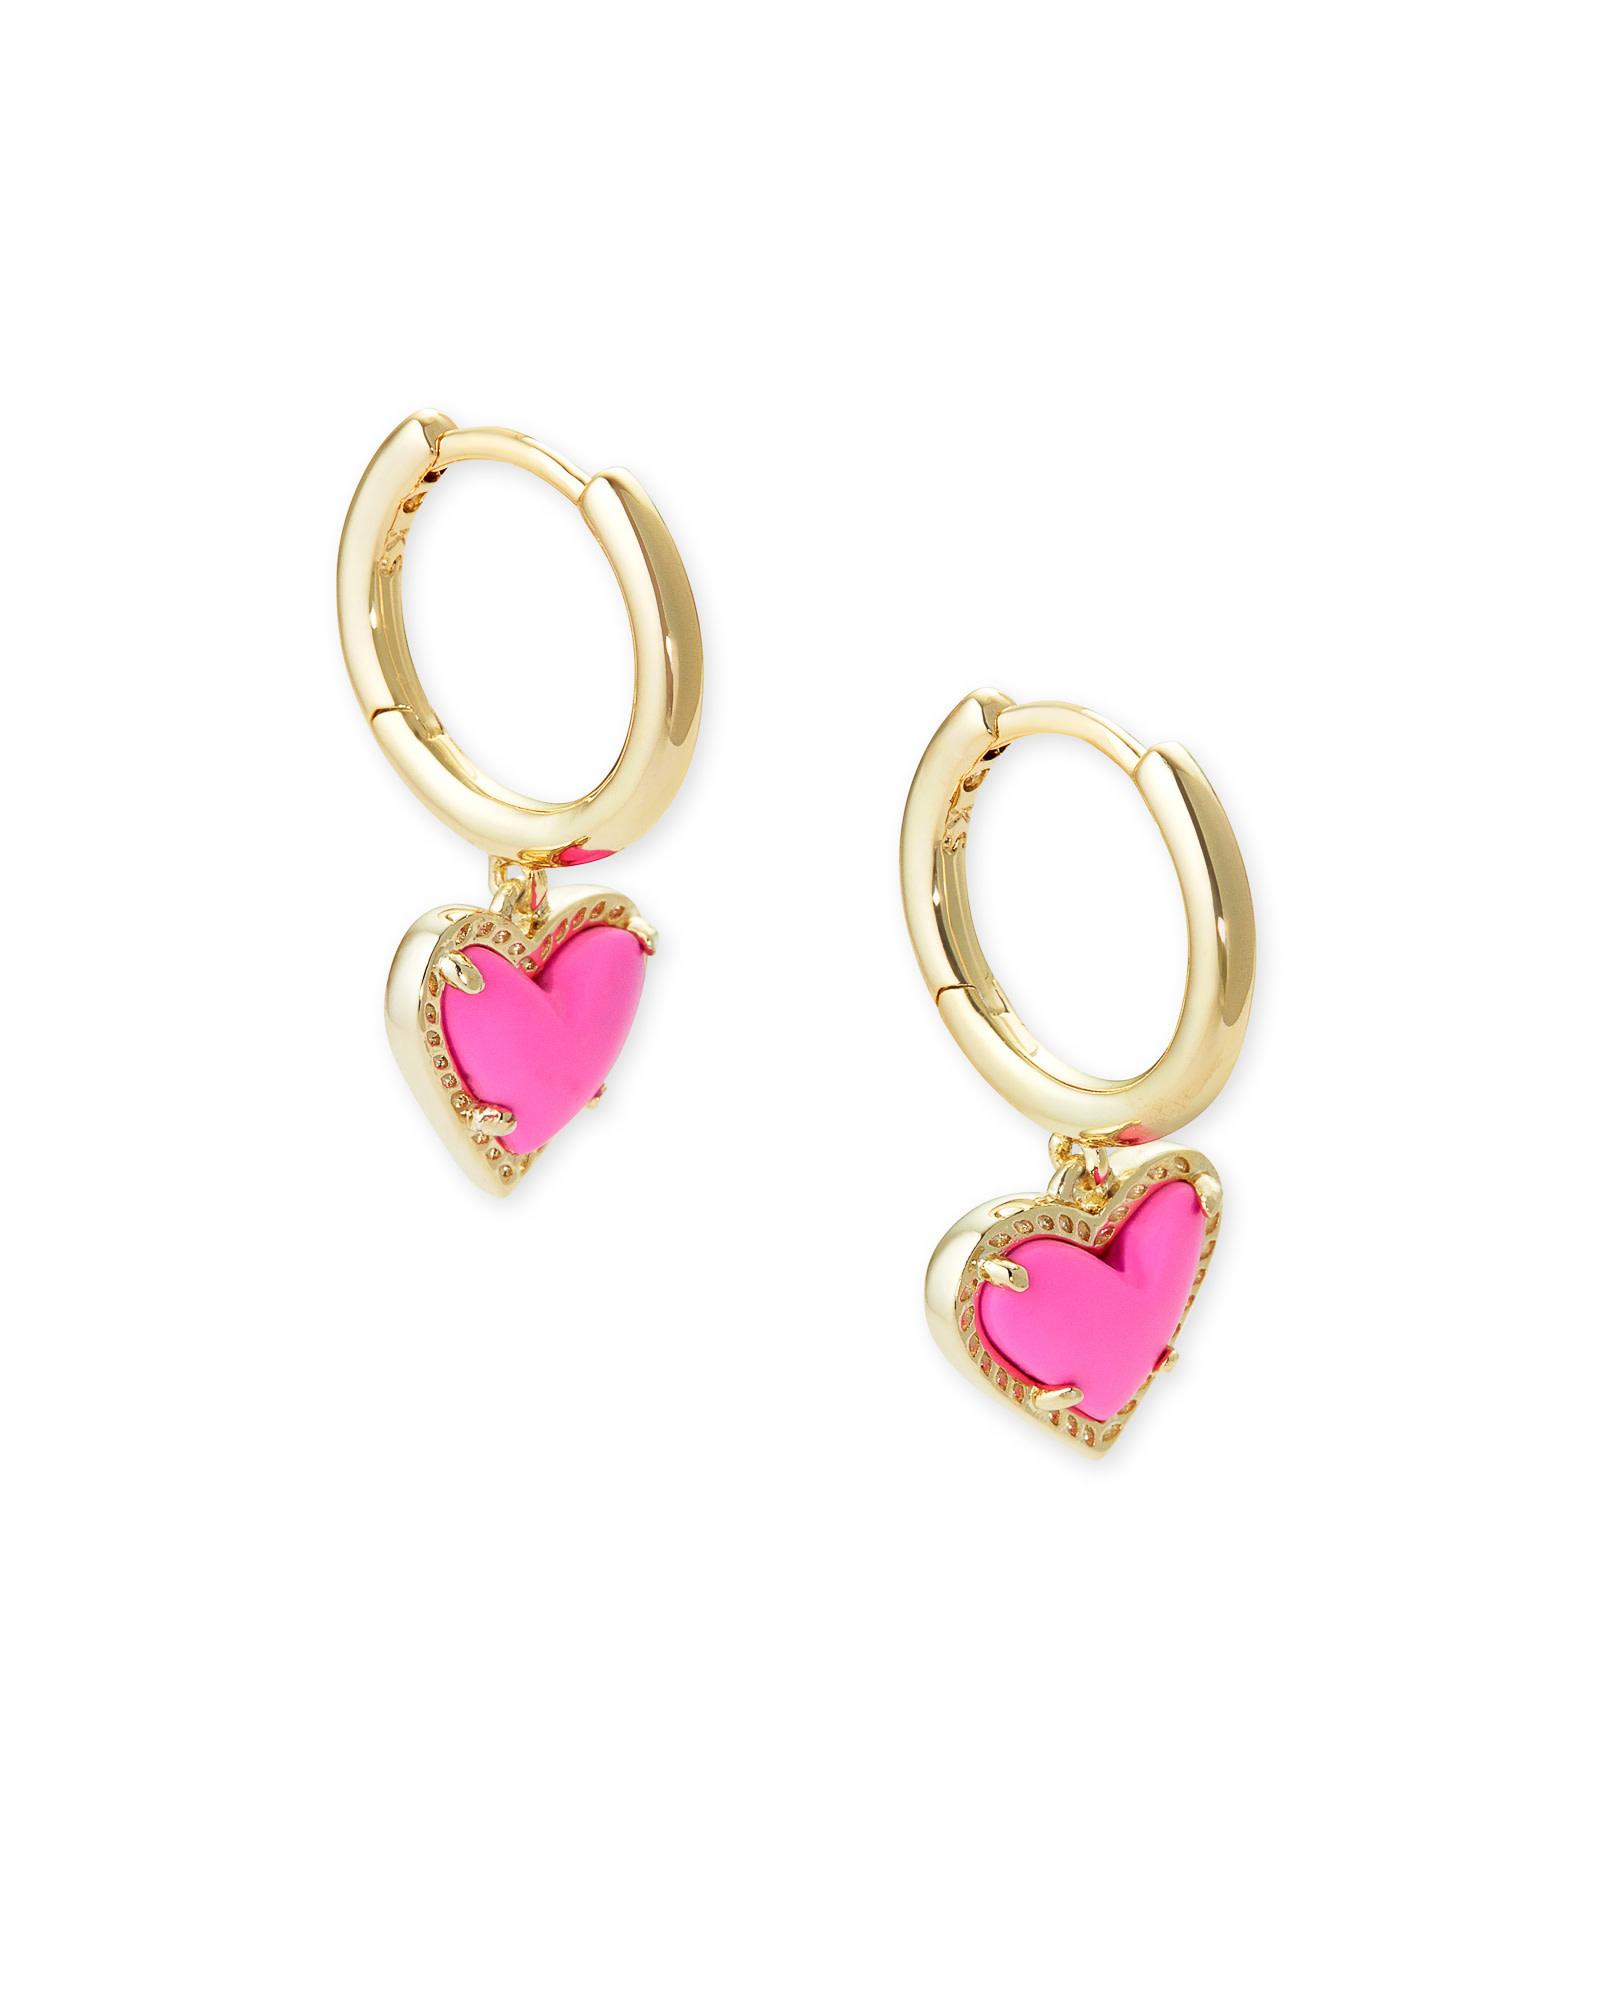 Ari Heart Huggie Earrings